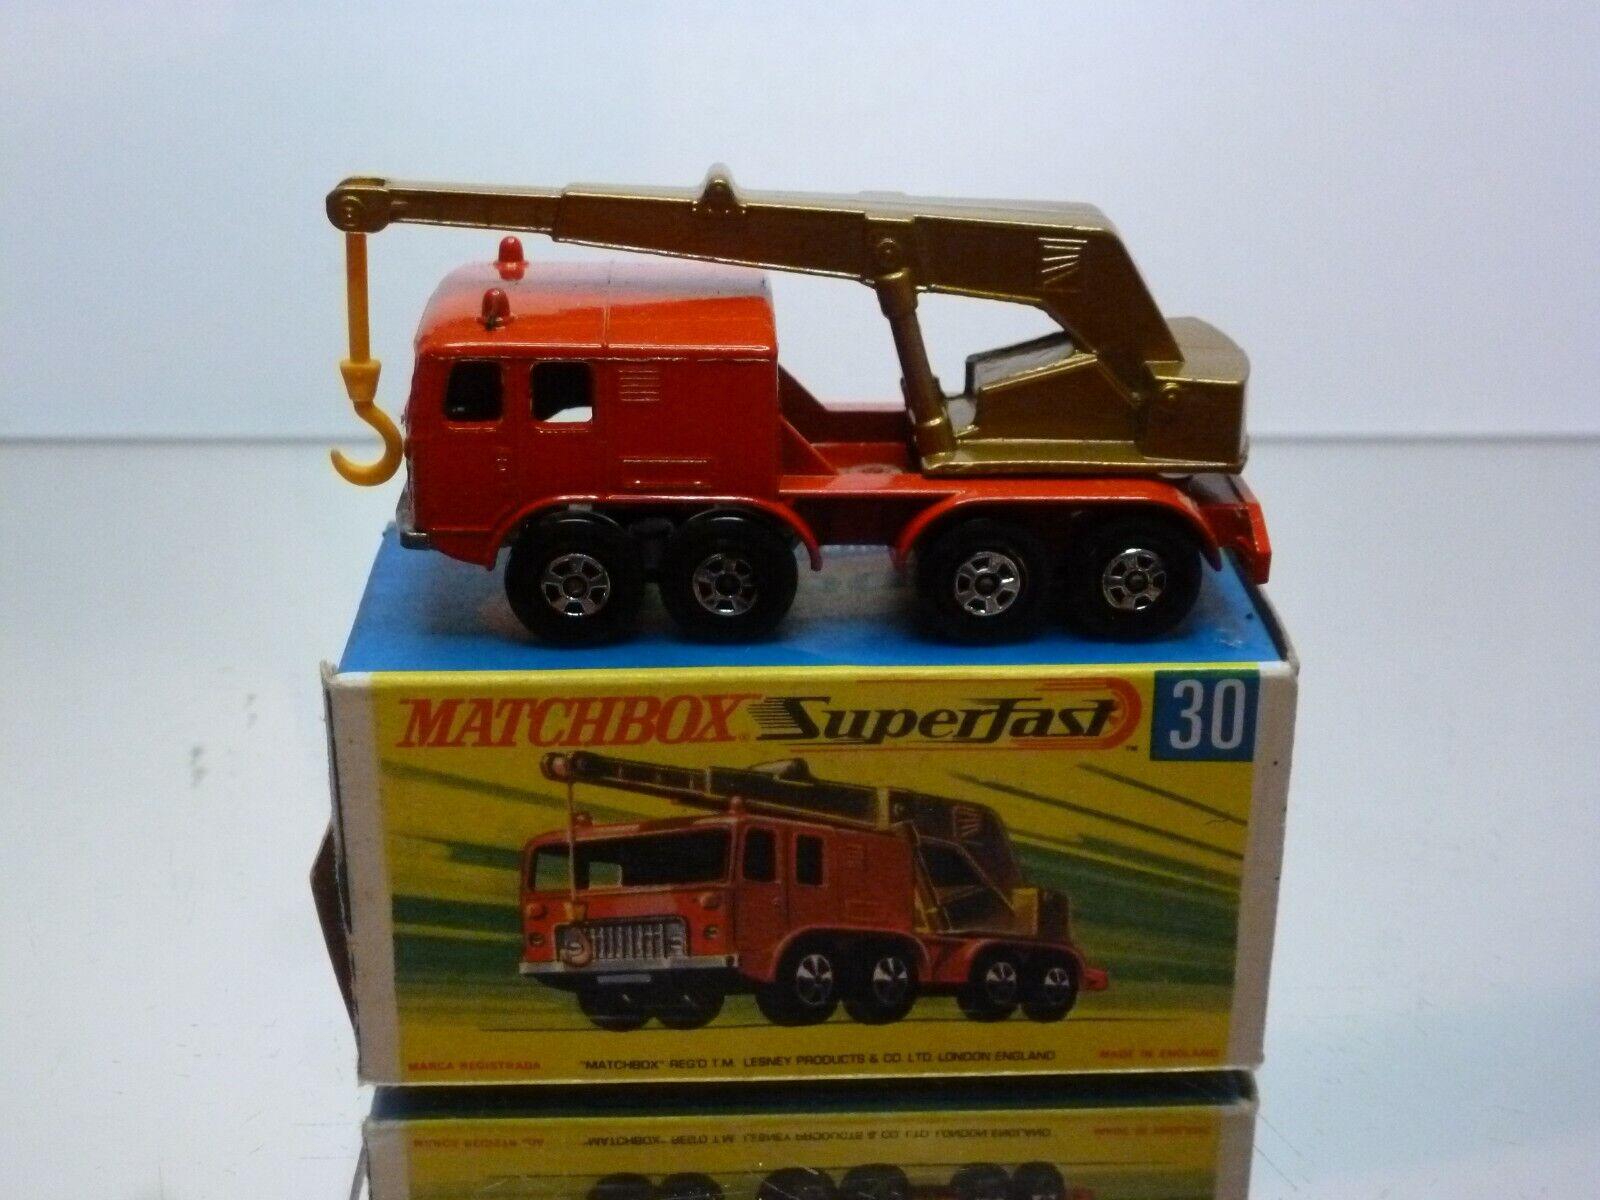 MATCHBOX SUPERFAST 30 8-WHEEL CRANE - rouge + or METALLIC - VERY GOOD IN BOX